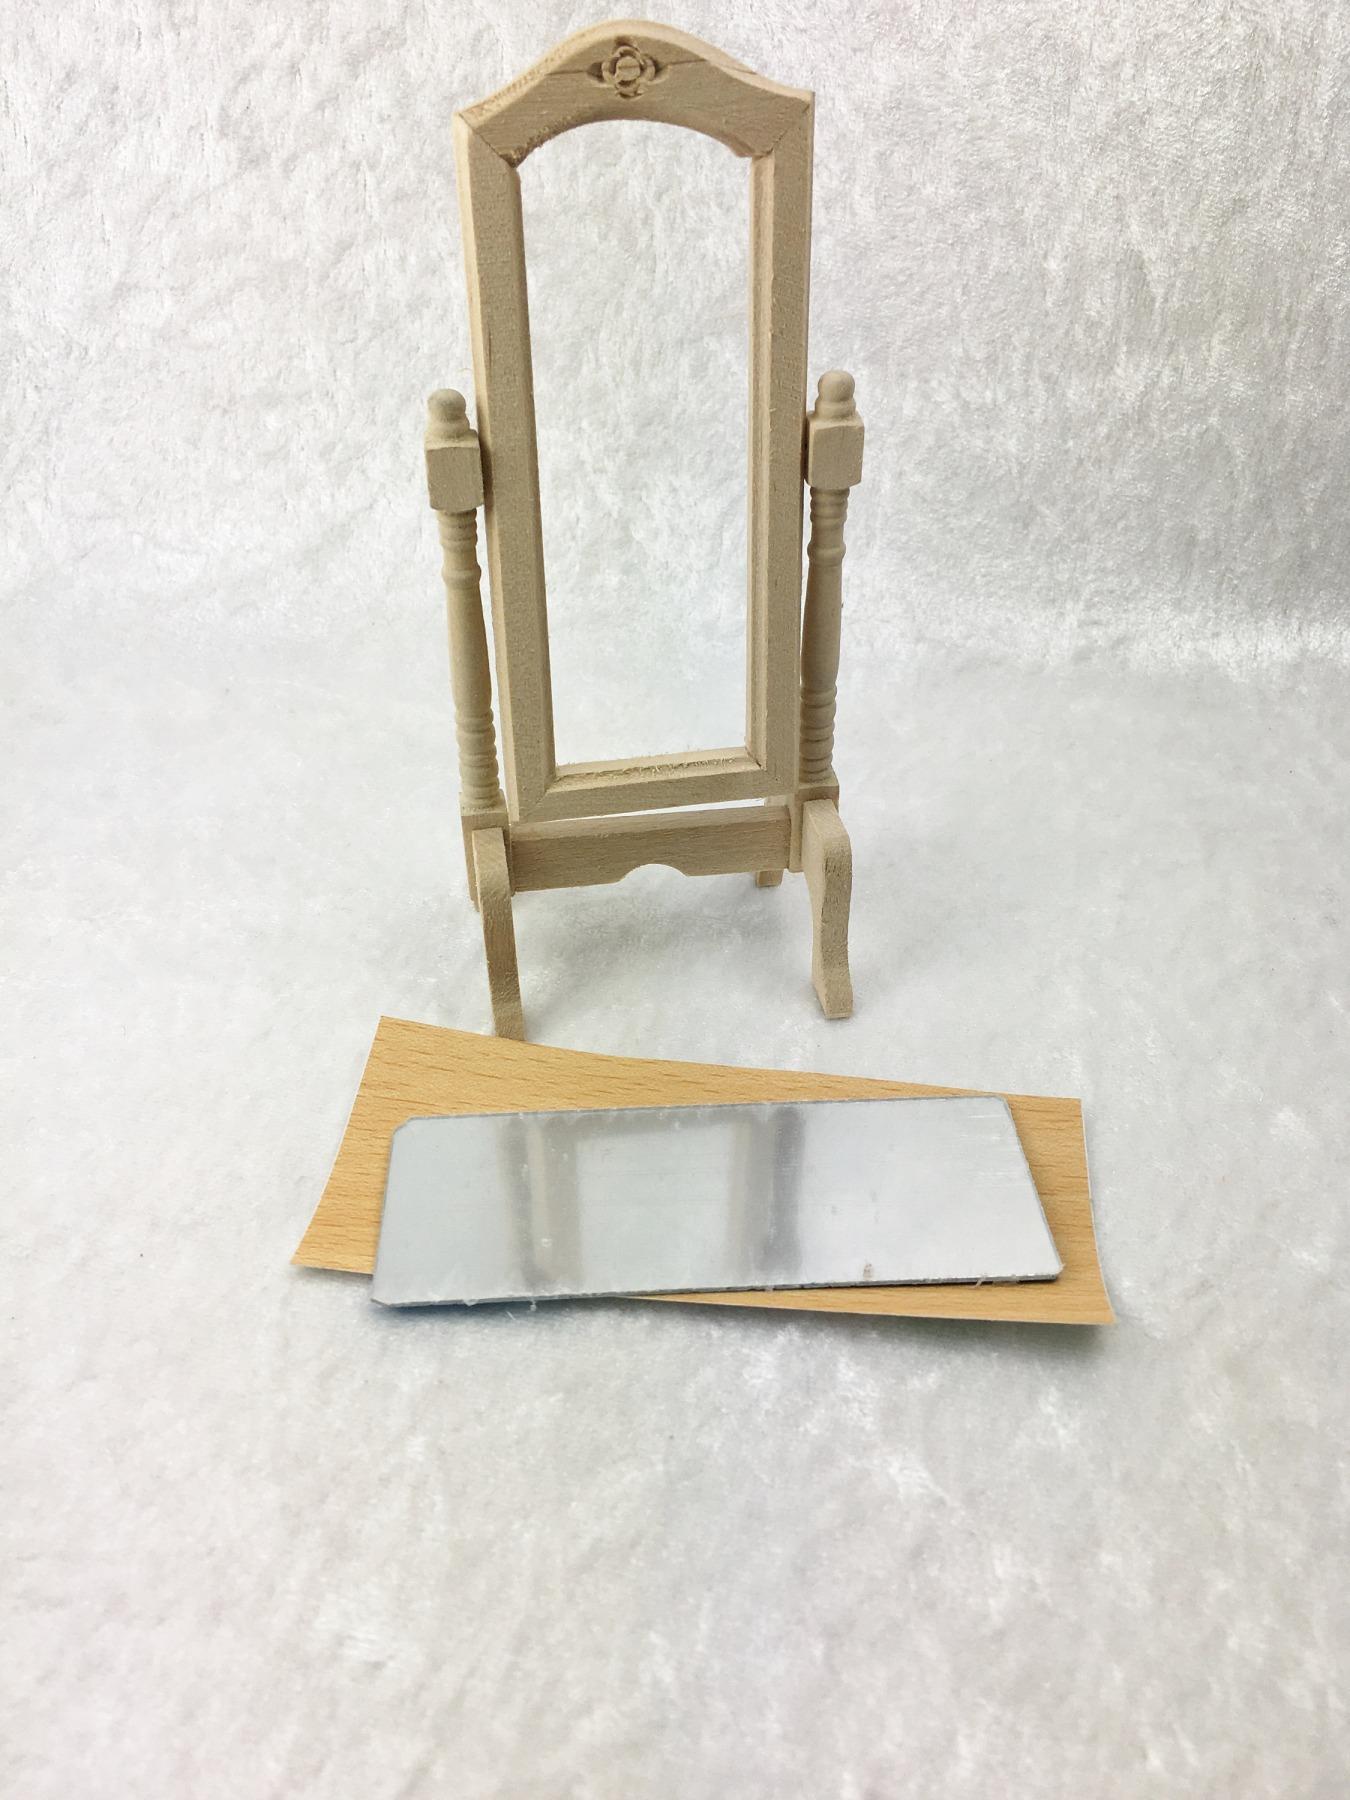 Standspiegel 1:12 Miniatur 8